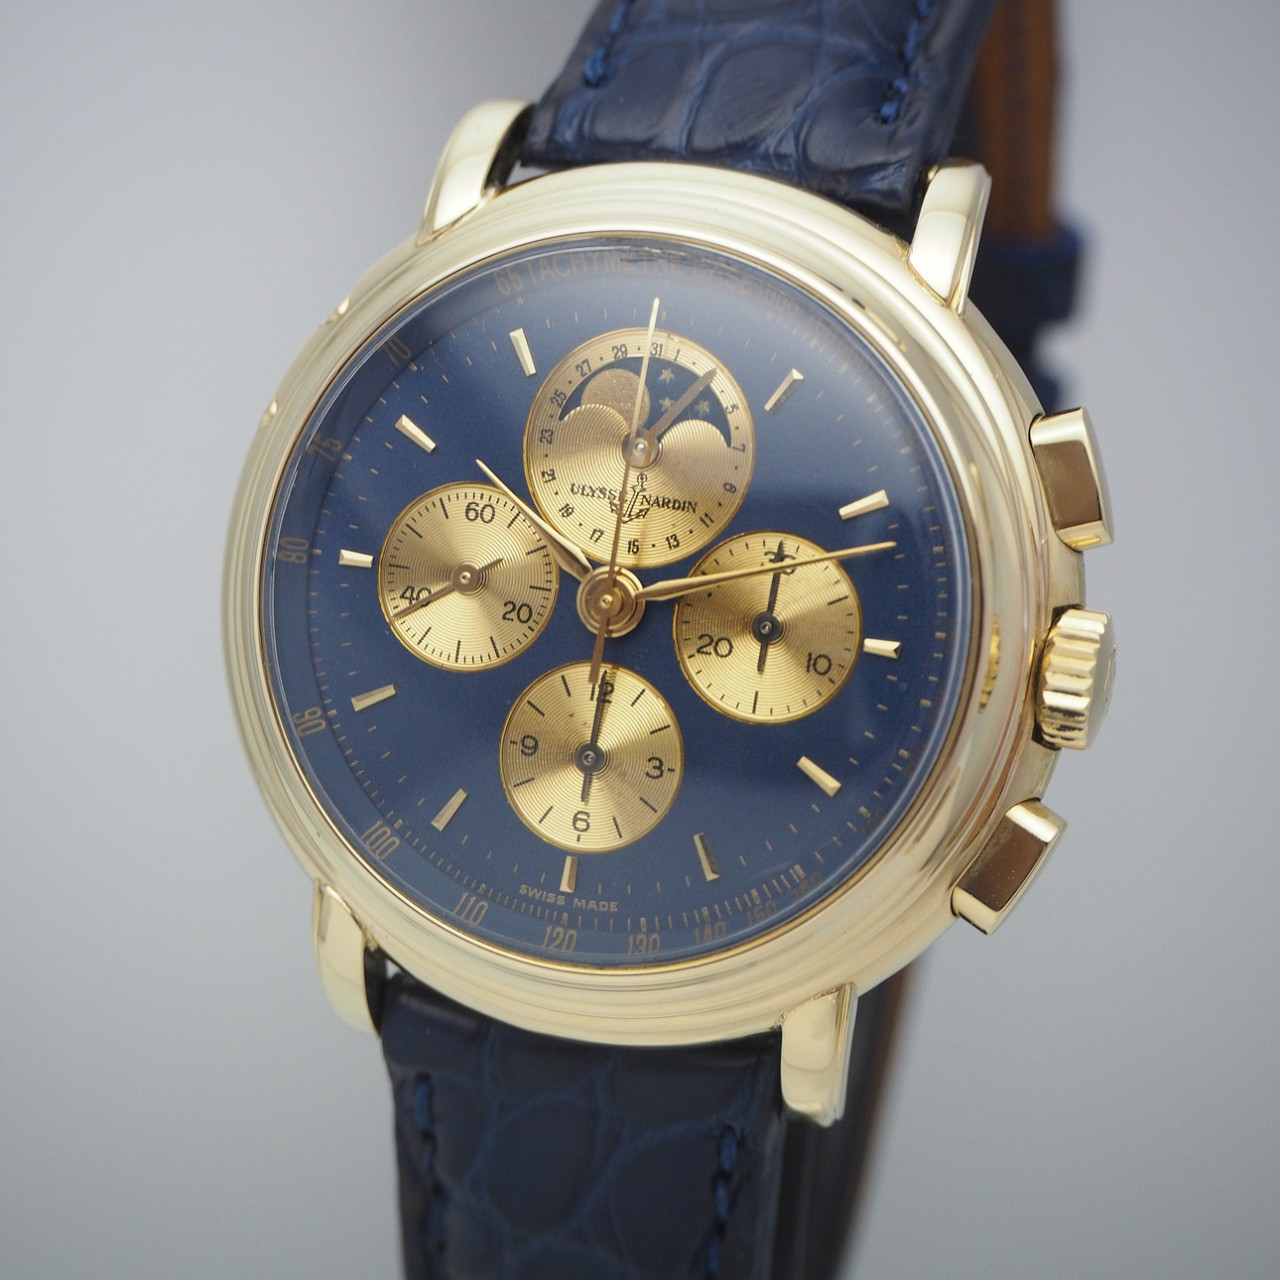 Ulysse Nardin Chronograph Calendar Moon, Limited Edition, Gold 18k/750